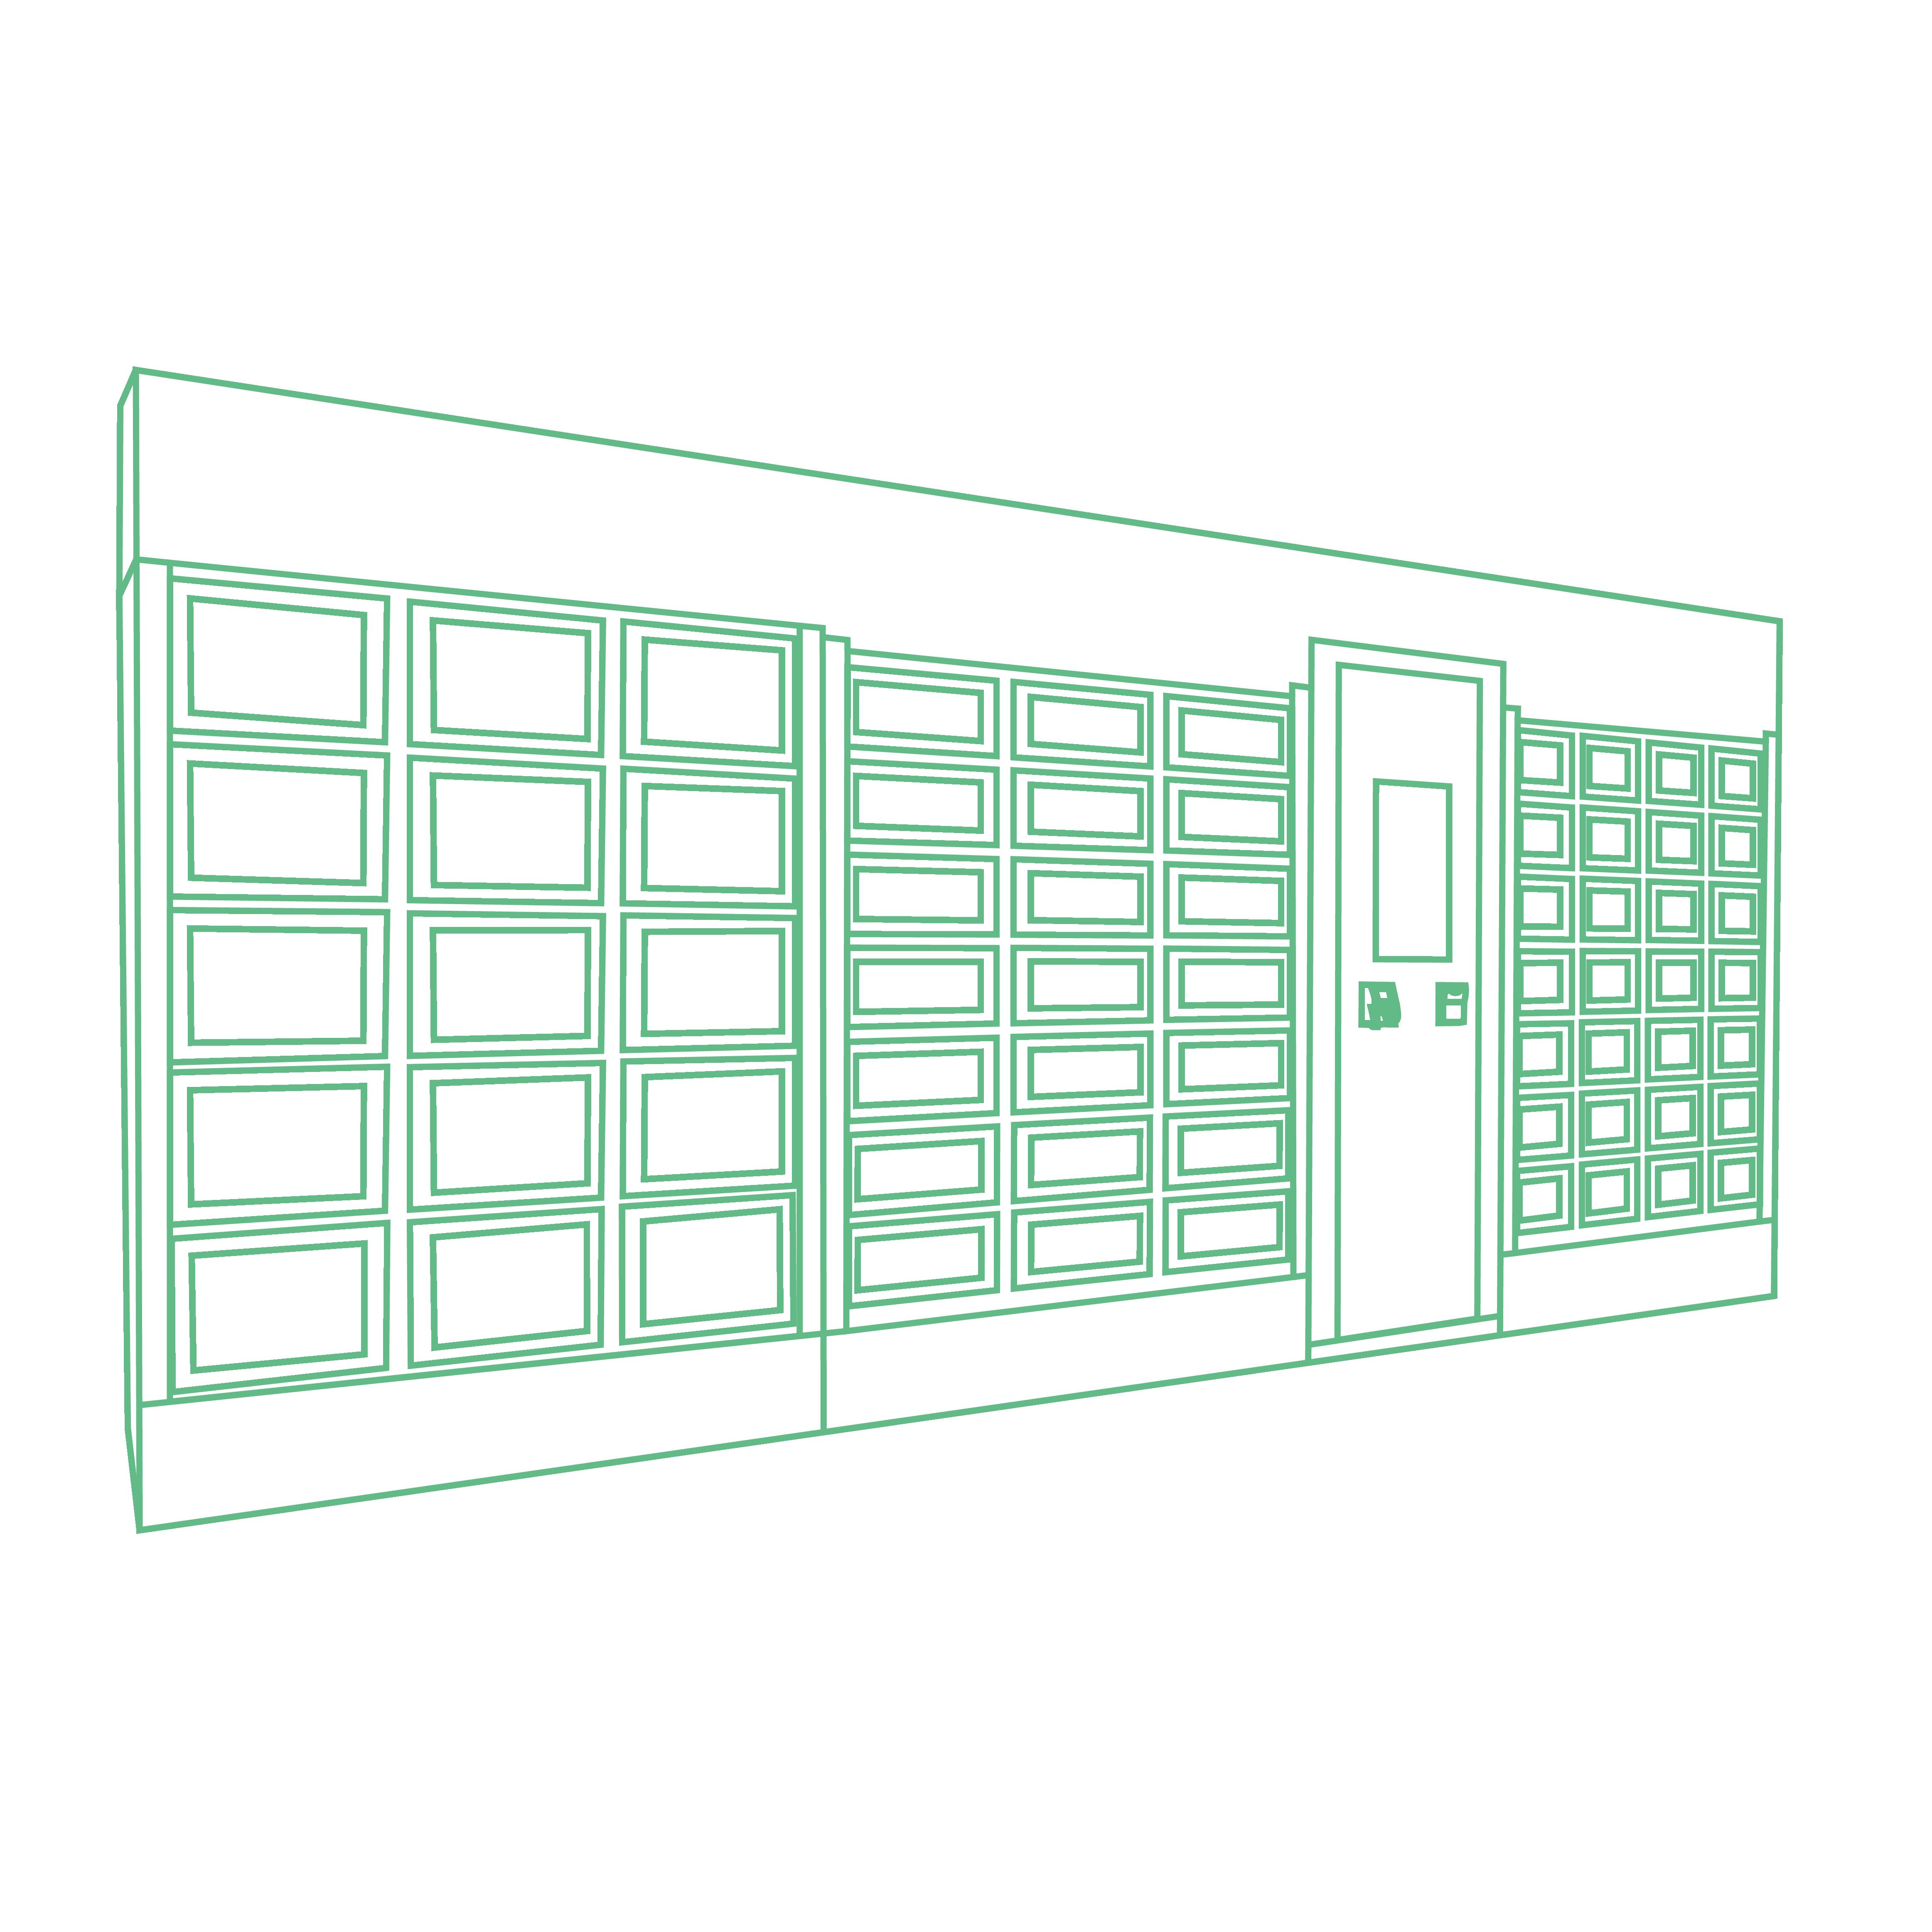 Personalization by a complete covering of a Le Casier Français vending machine